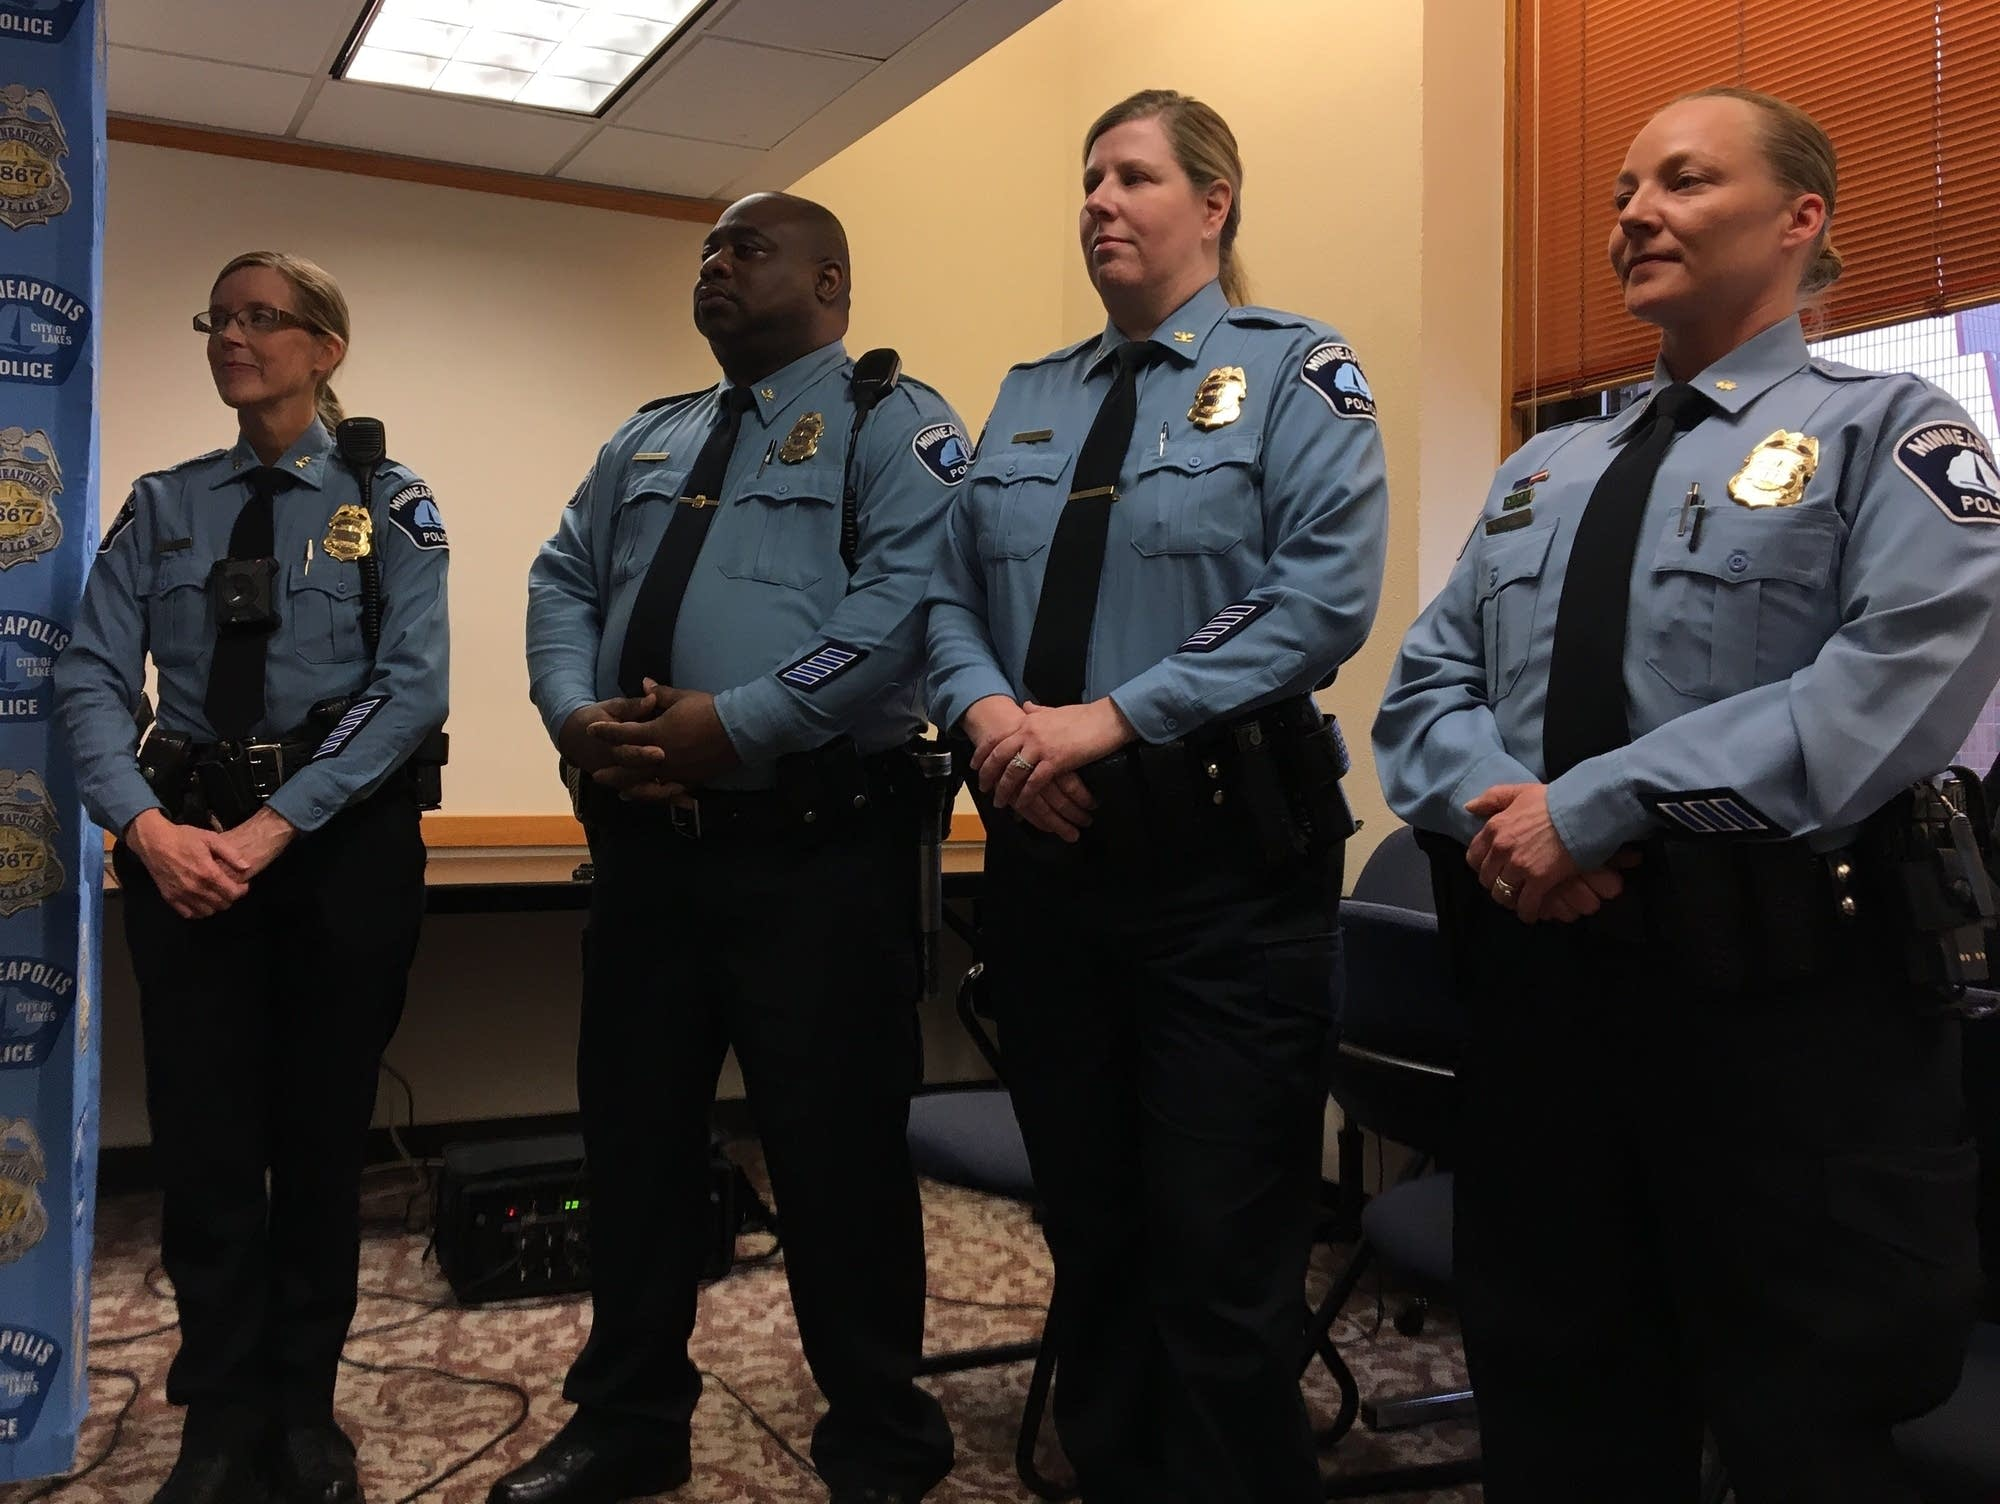 Deputy chief Waite, inspector Pulphus, inspector Huffman, Sgt. Blackwell